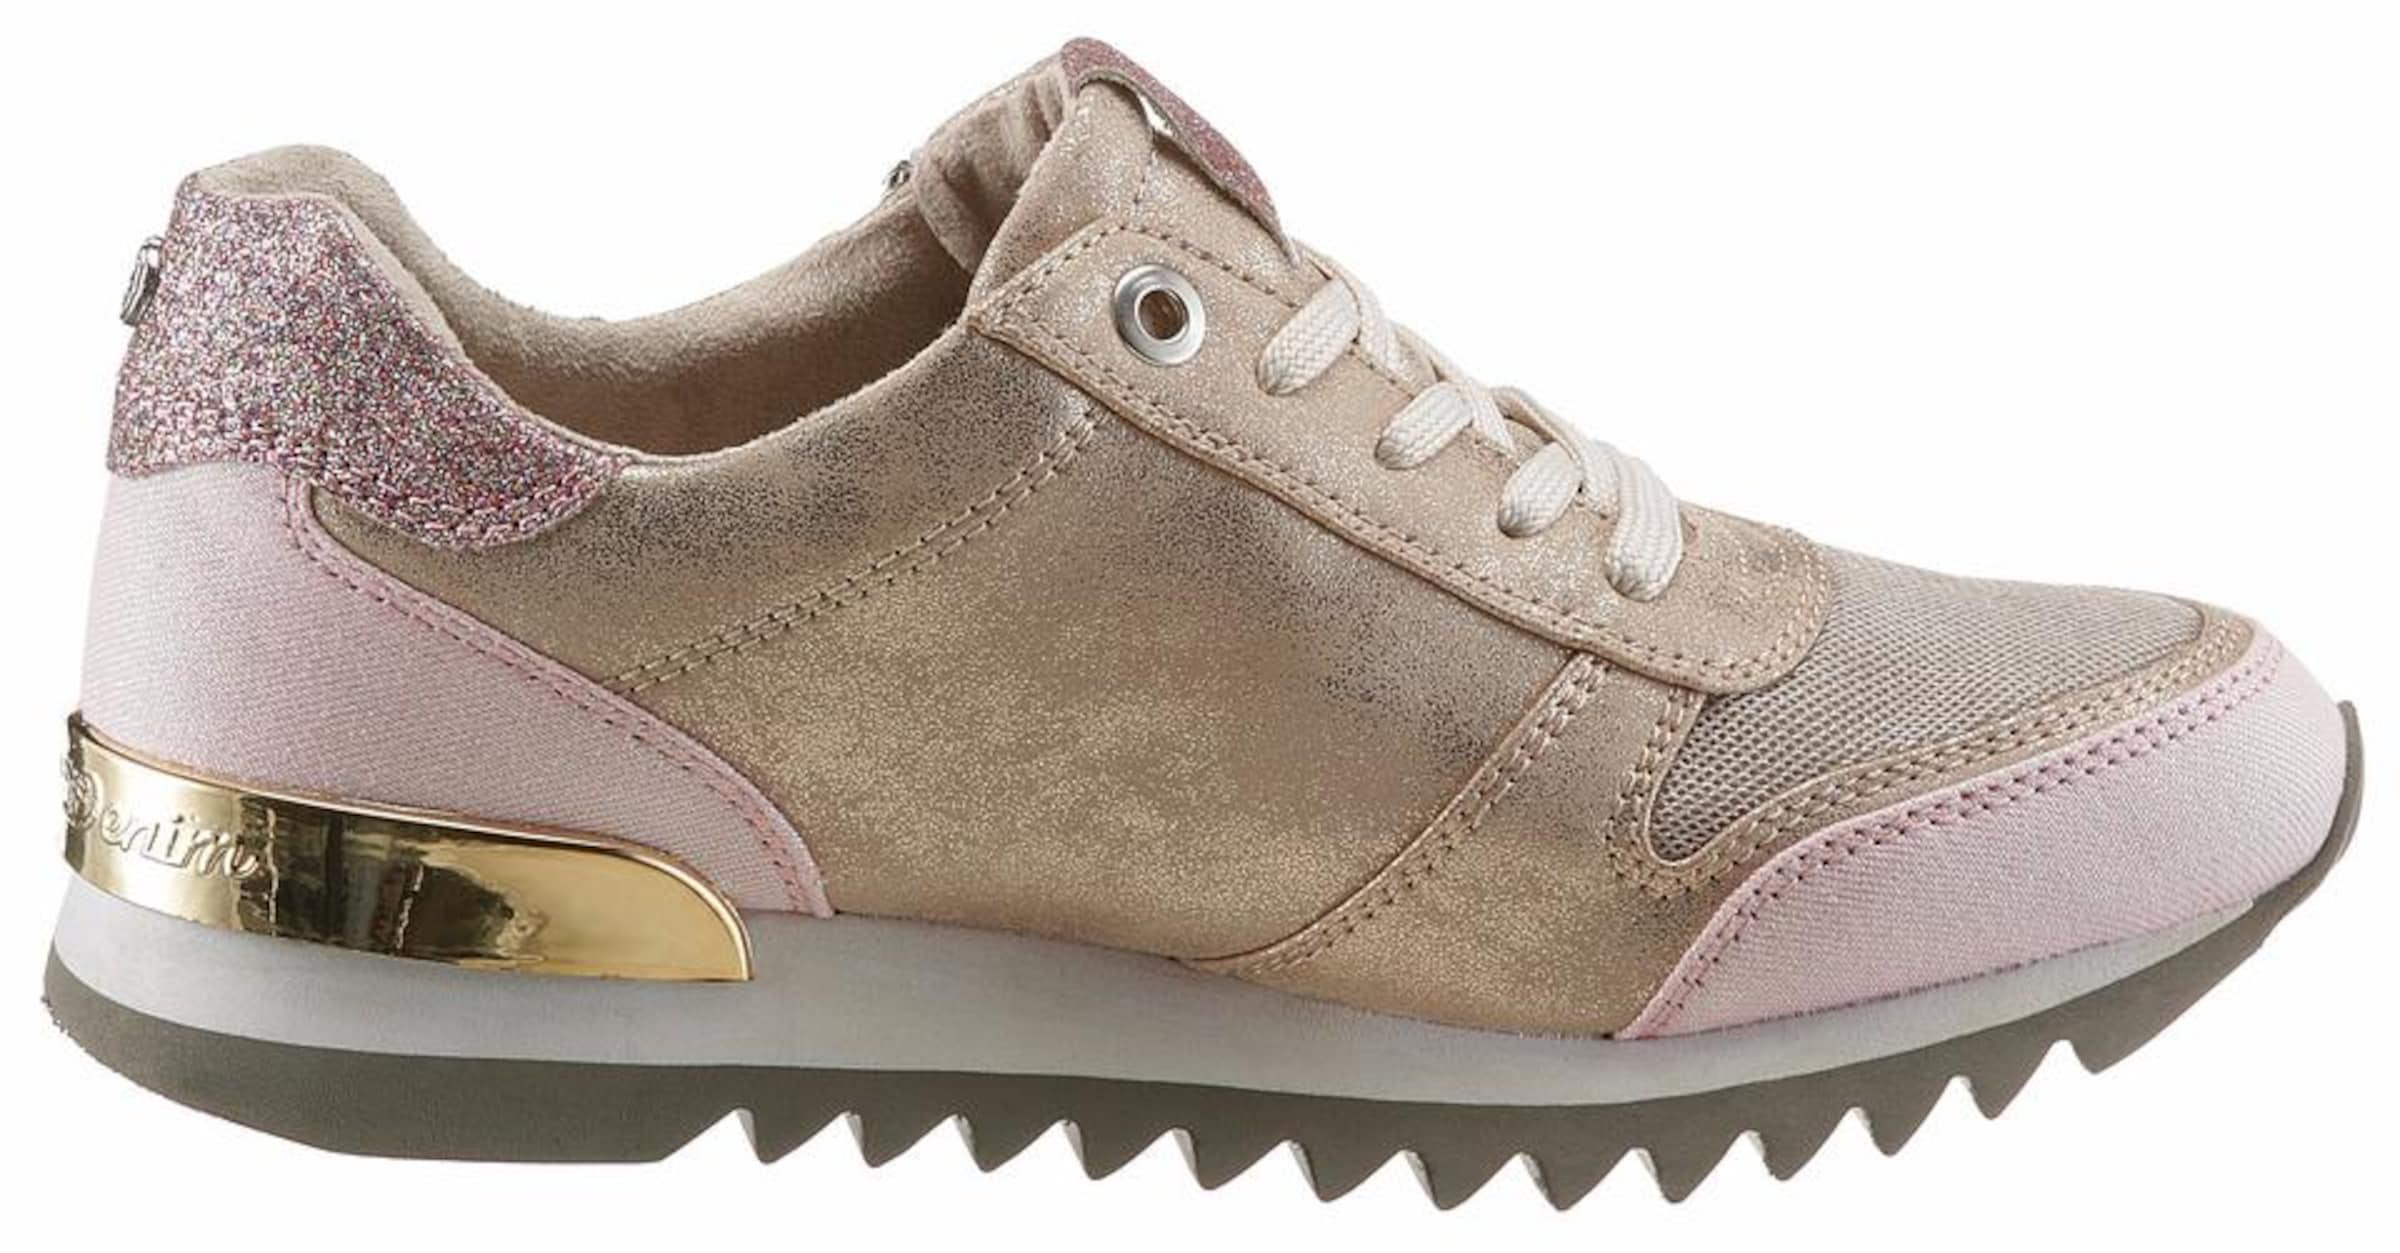 Austrittsstellen Online TOM TAILOR Sneaker Günstig Kaufen Angebot Rabatt-Outlet-Store frLYsVgZF